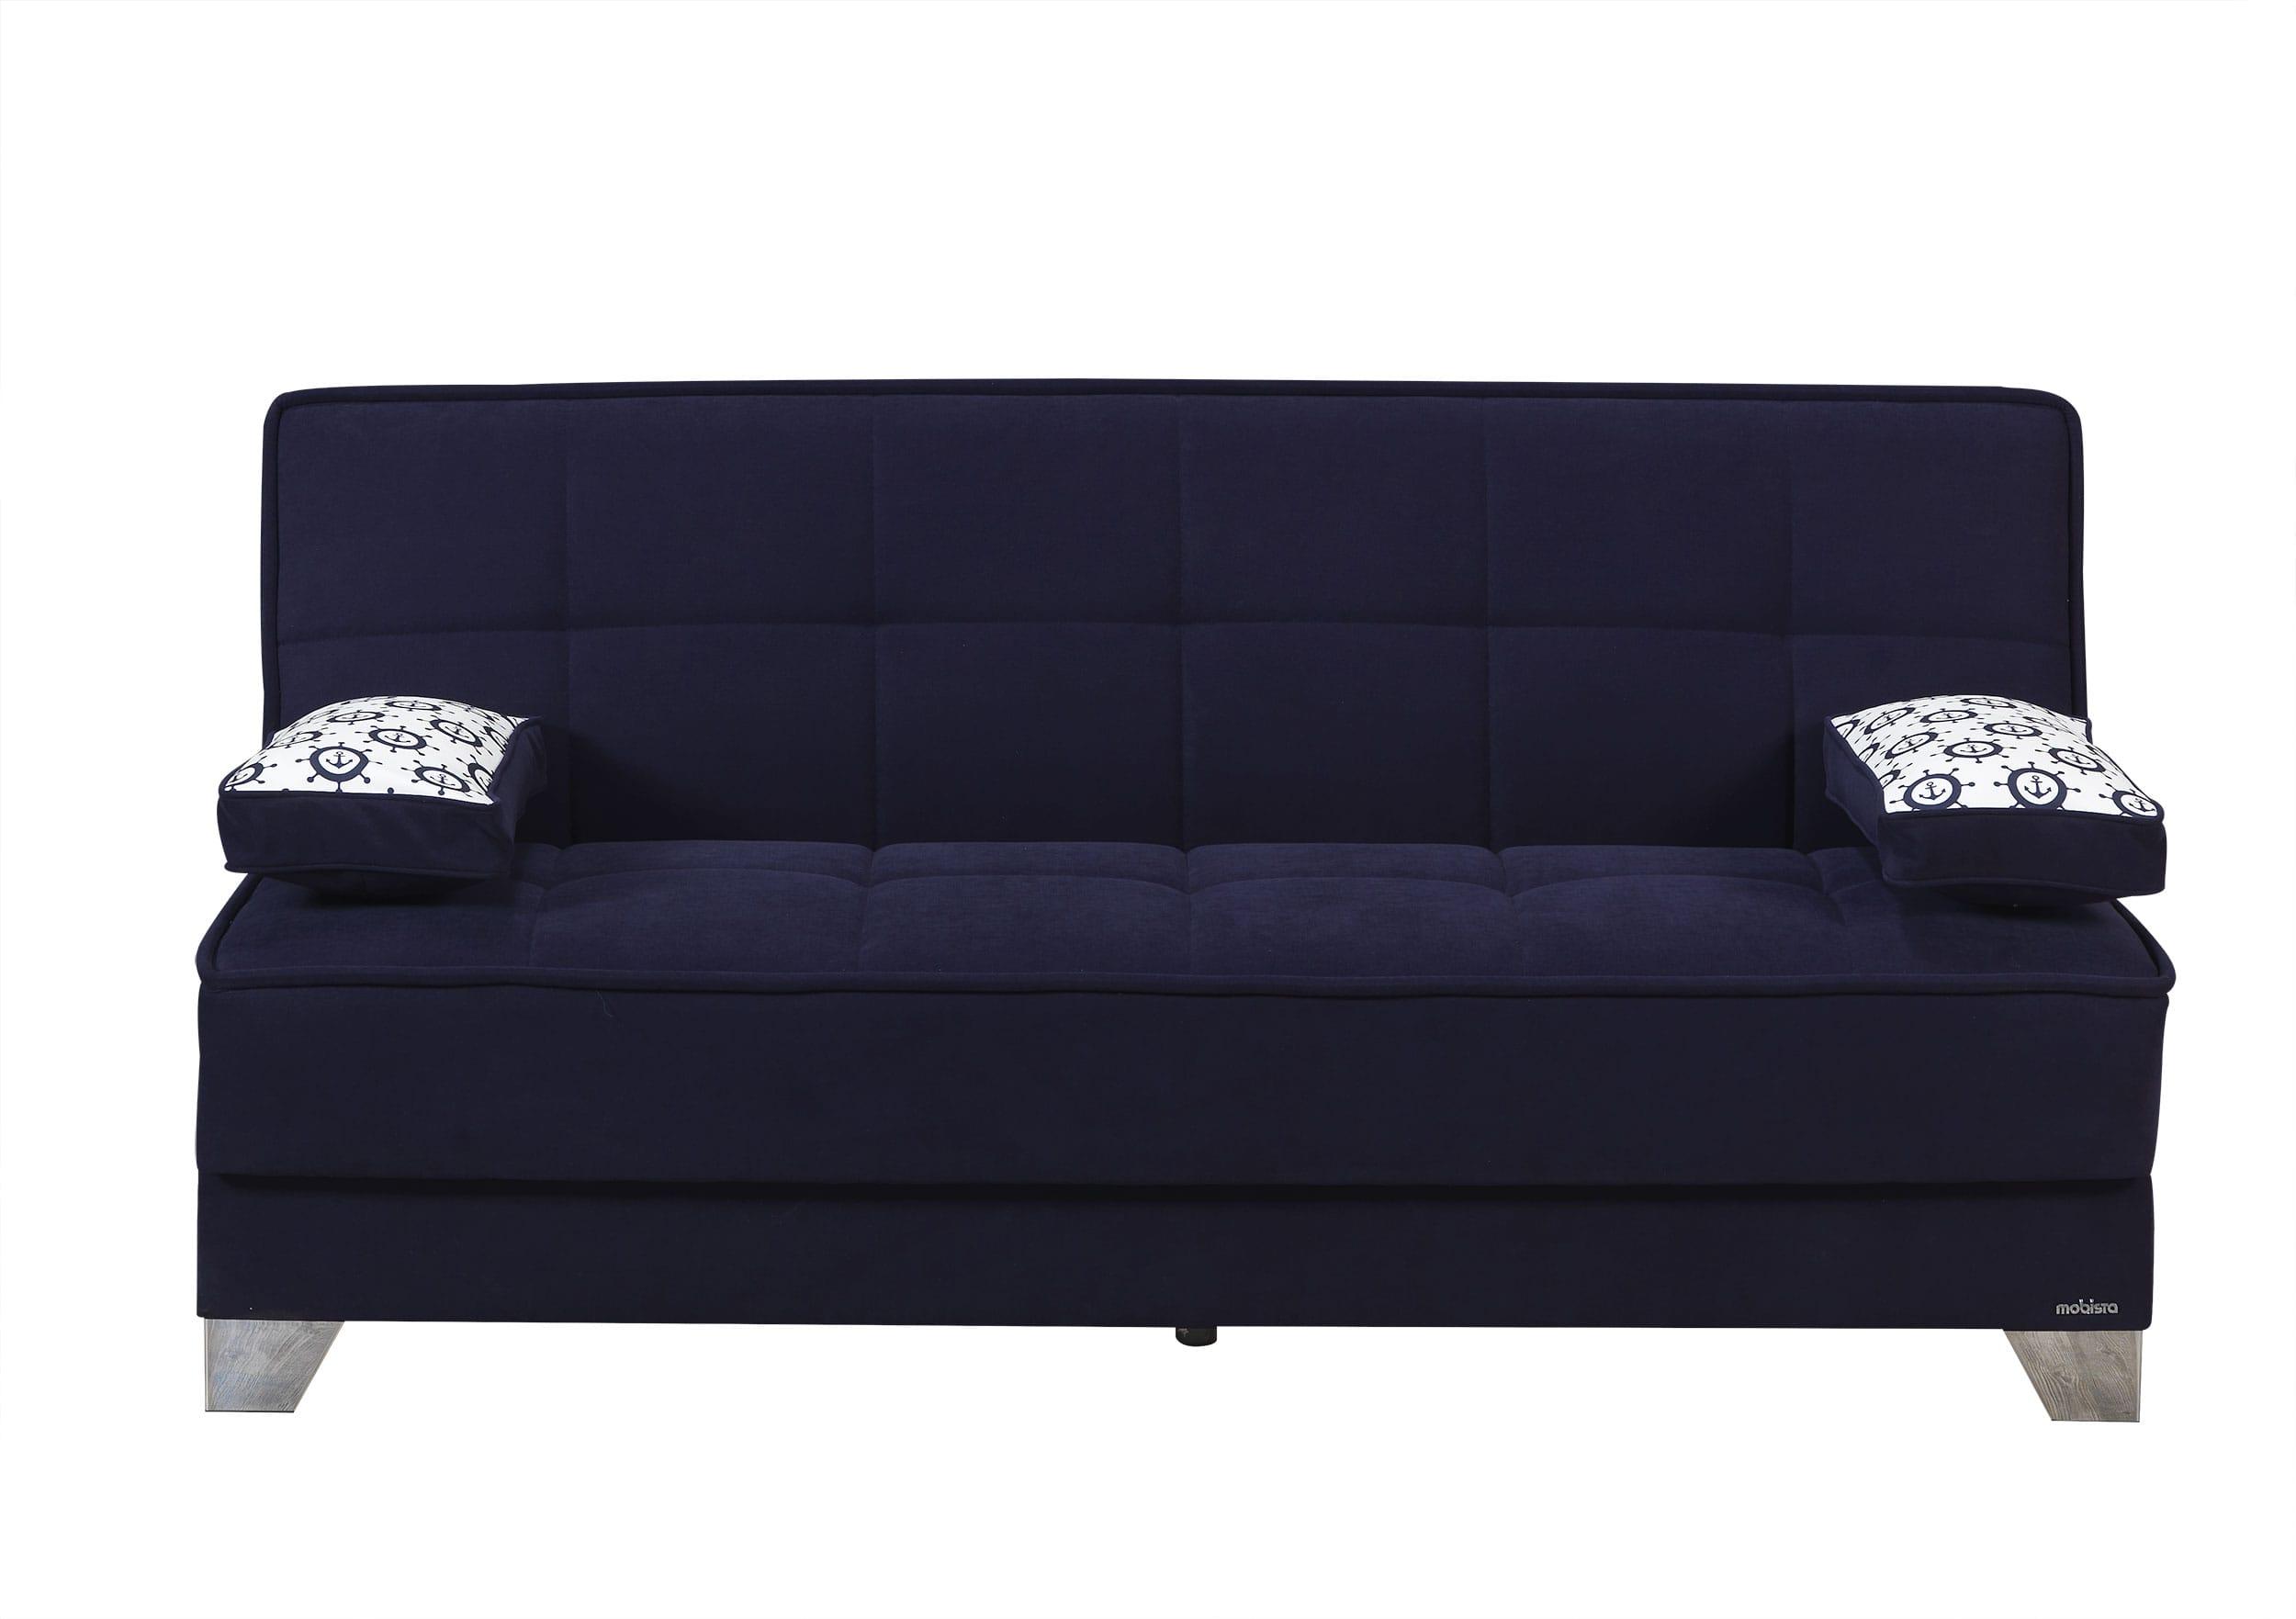 Nexo Carisma Navy Blue Sofa Bed By Mobista (Mobista)